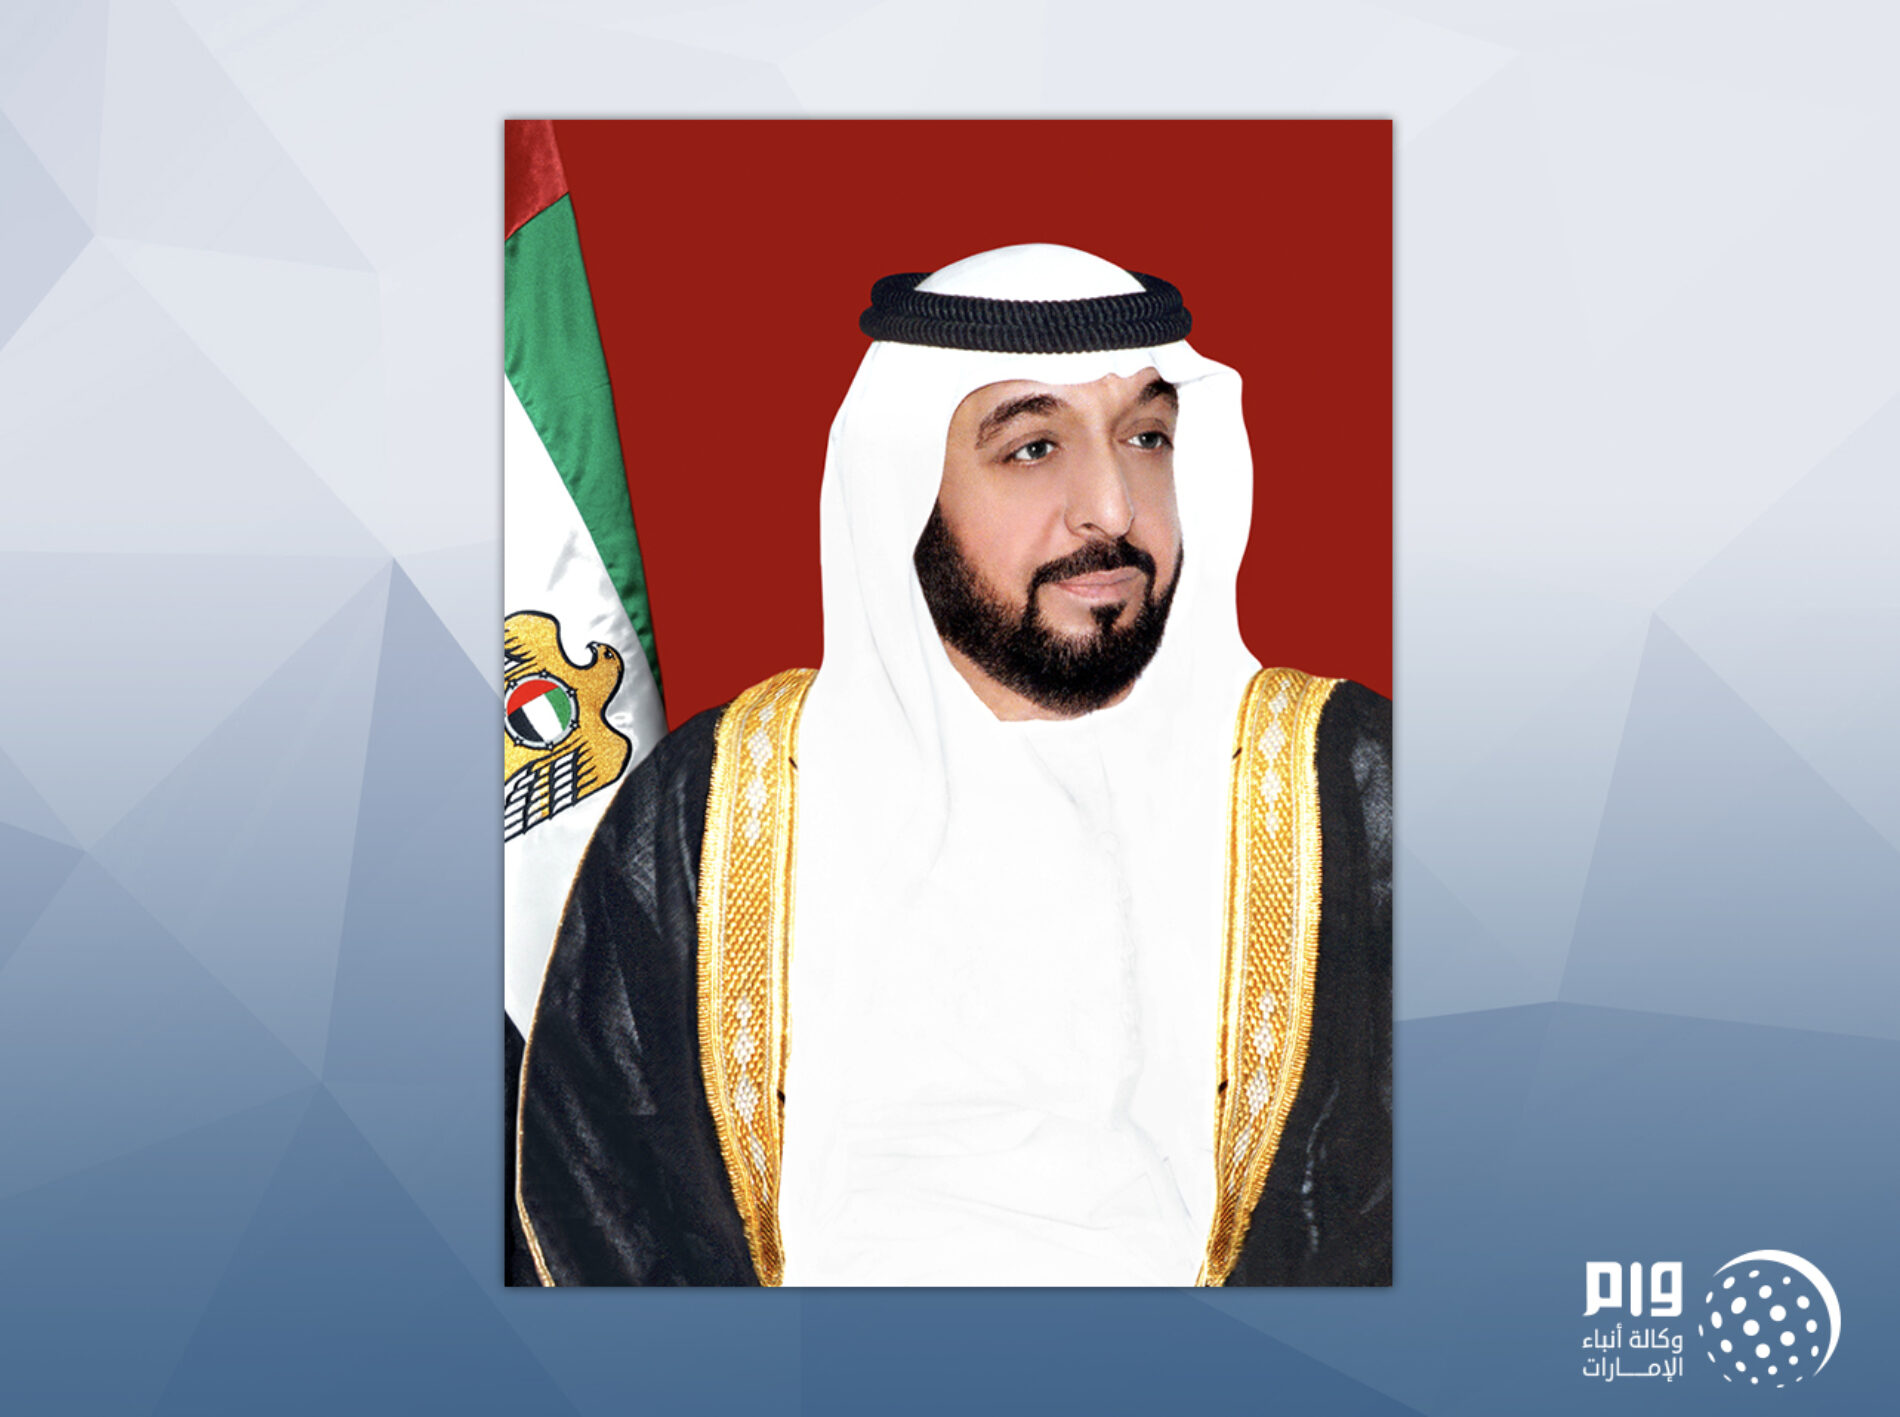 Khalifa bin Zayed: Planta de Energía Nuclear de Barakah es motivo de orgullo